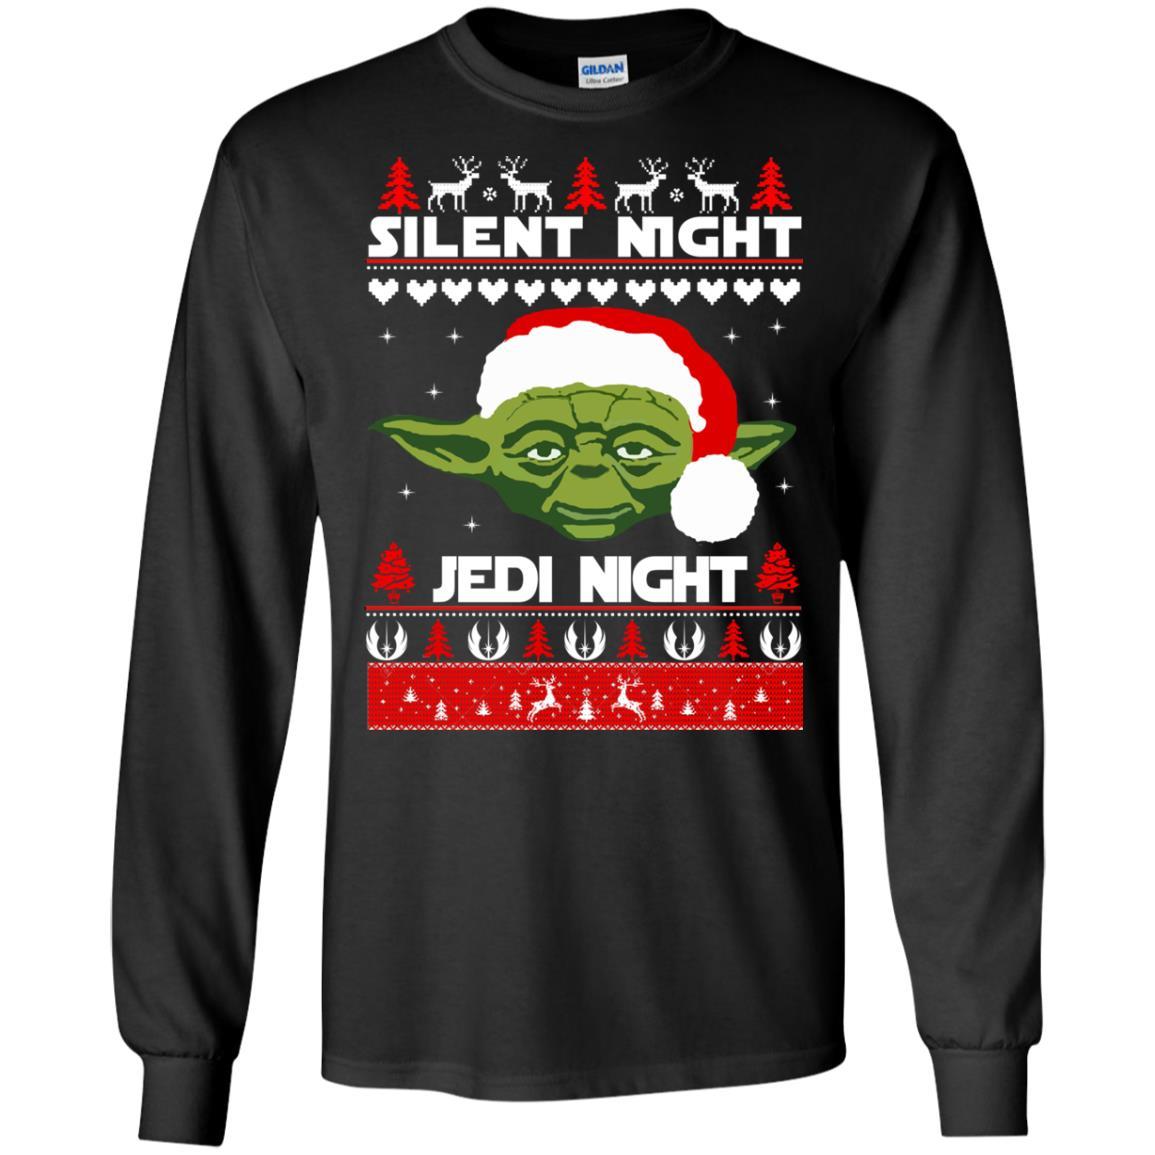 image 1712 - Yoda Star Wars: Silent Night Jedi Night Christmas Sweater, Hoodie